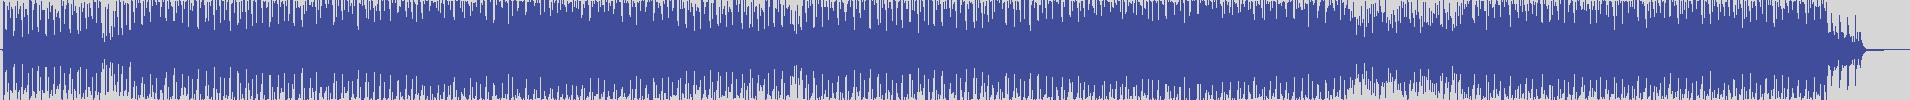 smilax_dig_records [Smilax_X448DIG] Life Girl - Un'estate Al Mare [Original Mix] audio wave form